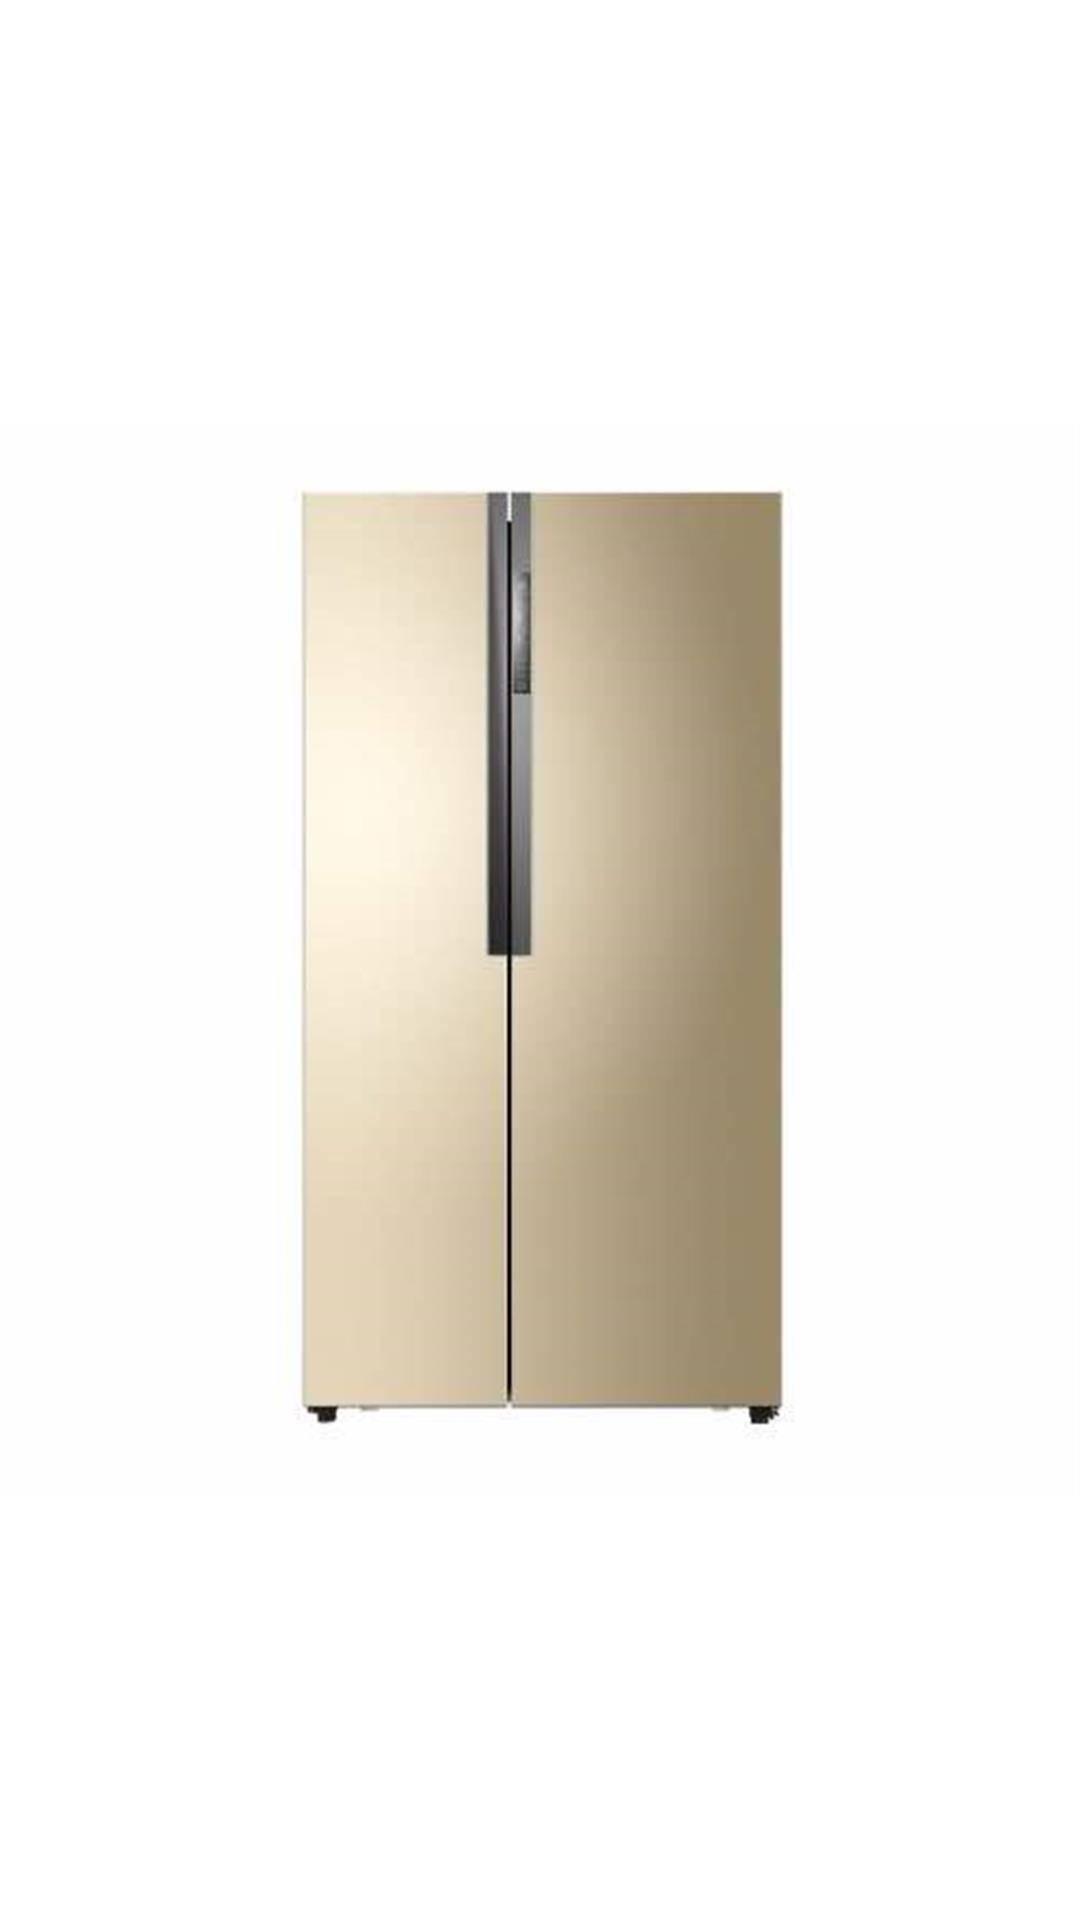 L.G Side by side Refrigerator